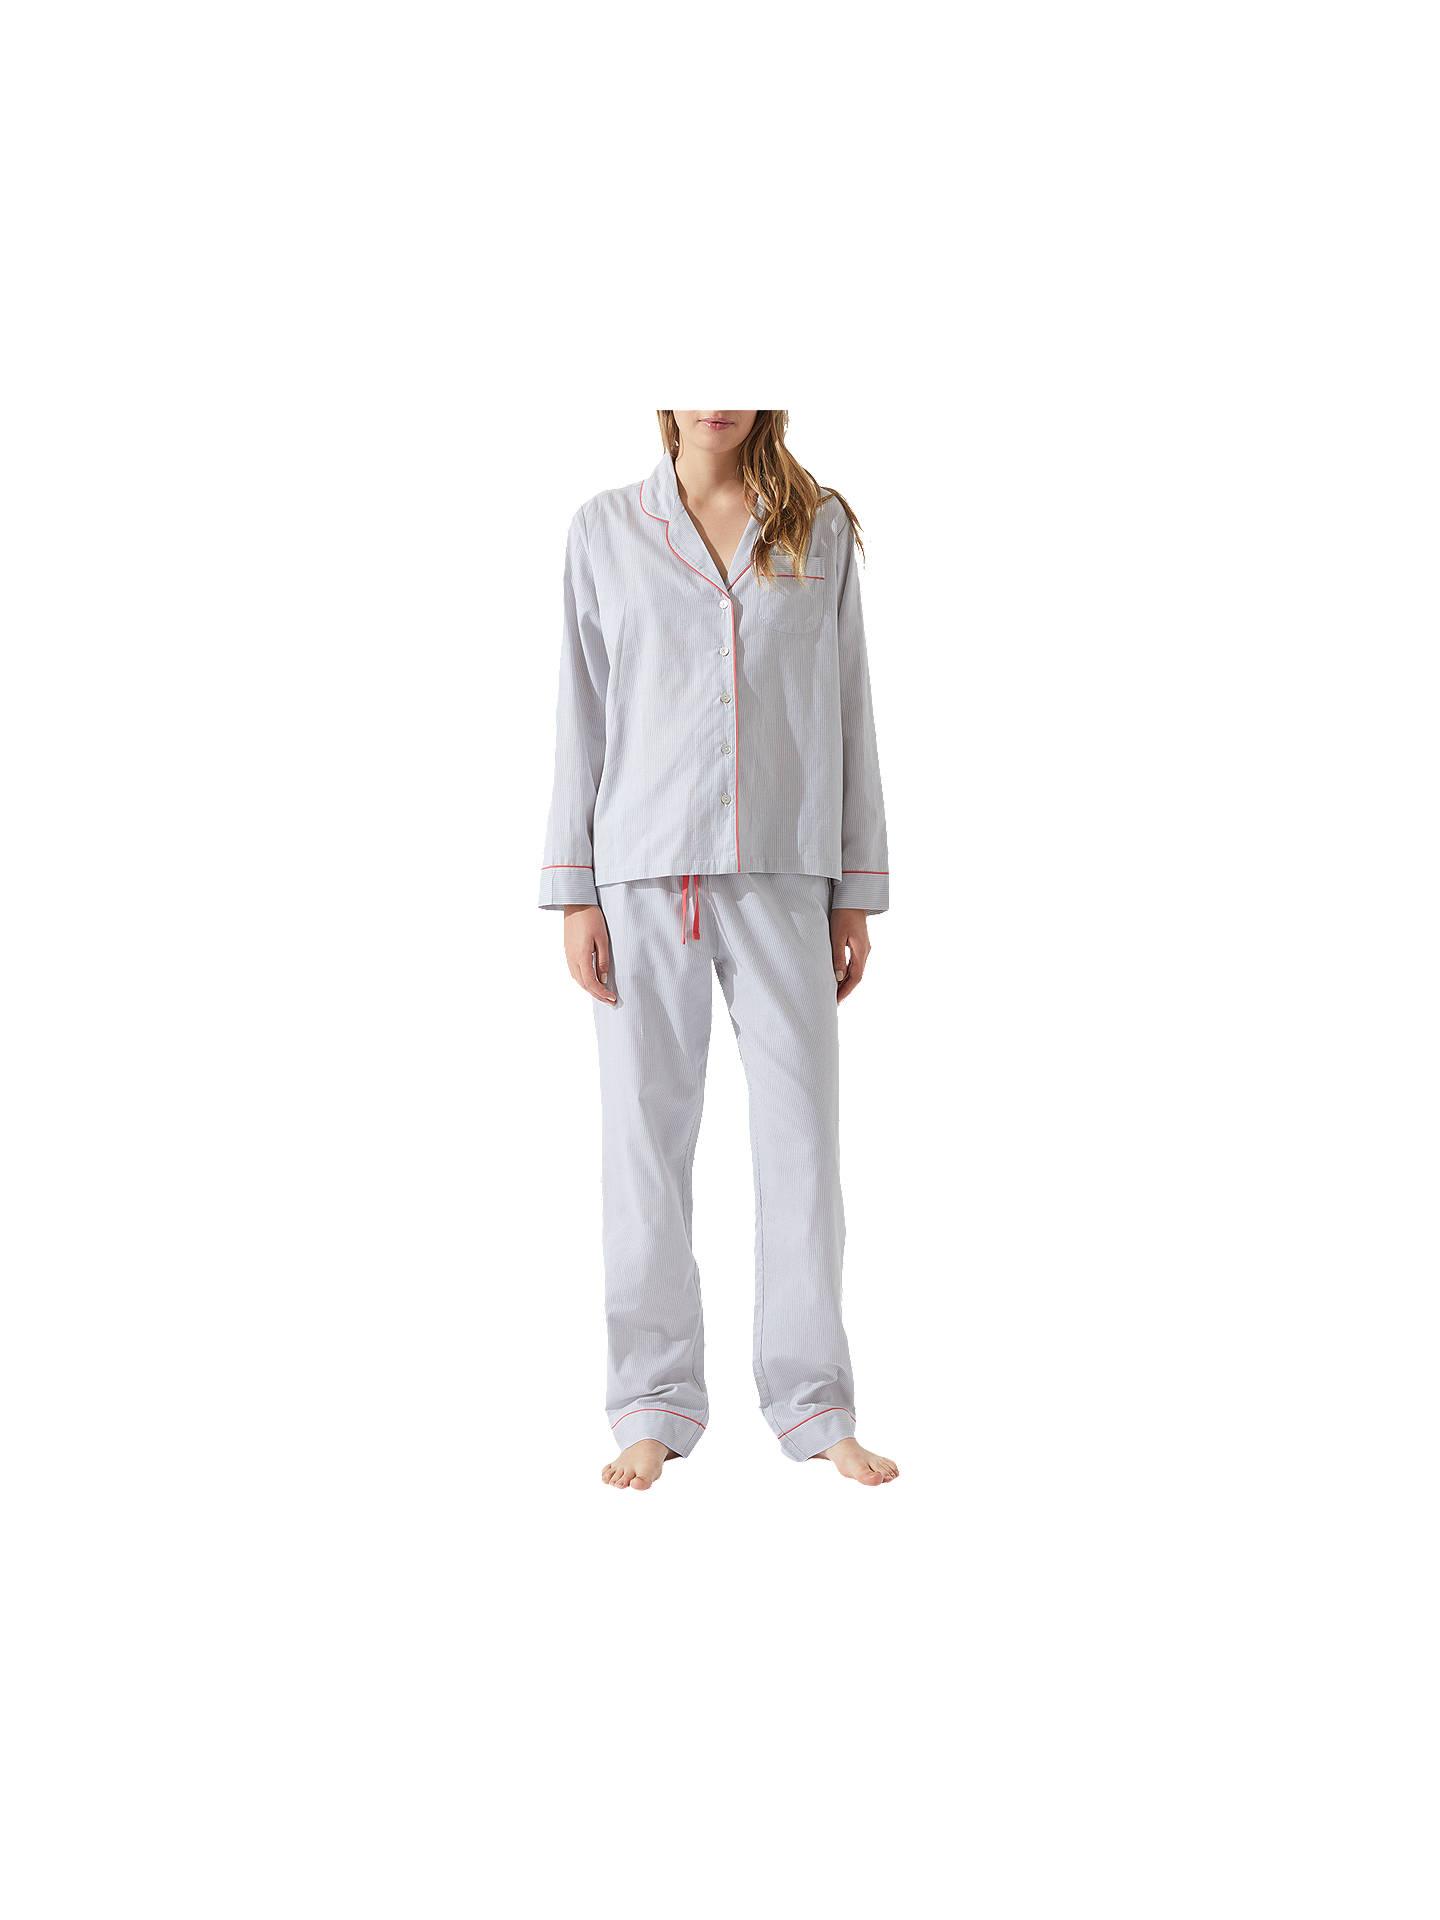 d6a156290 Buy Jigsaw Florence Cotton Blend Pyjamas, Grey, XS Online at johnlewis.com  ...